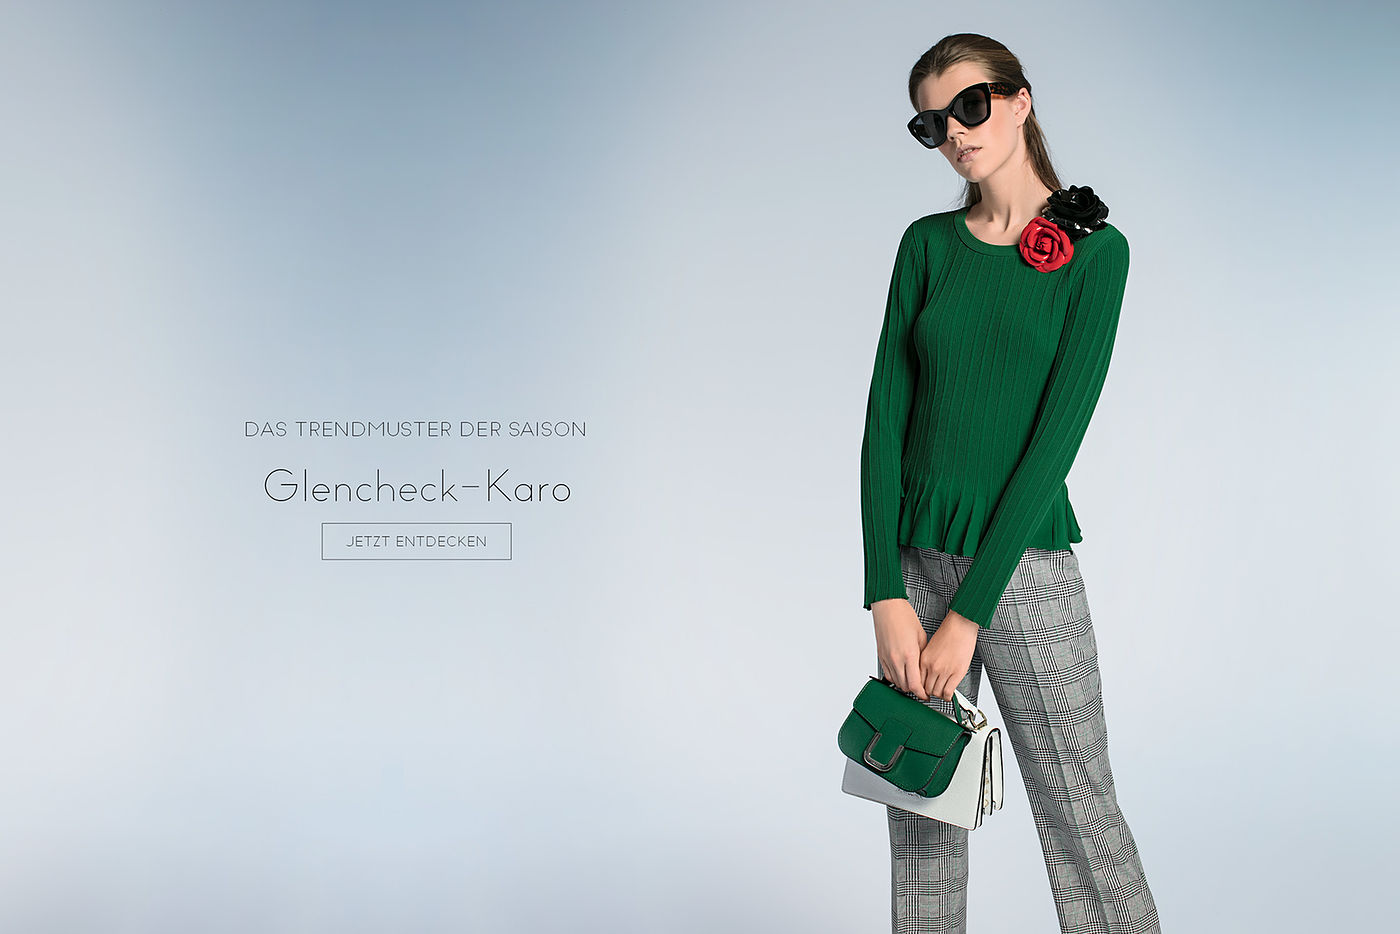 Damenmode Von Marc Cain Kaufen Official Online Shop